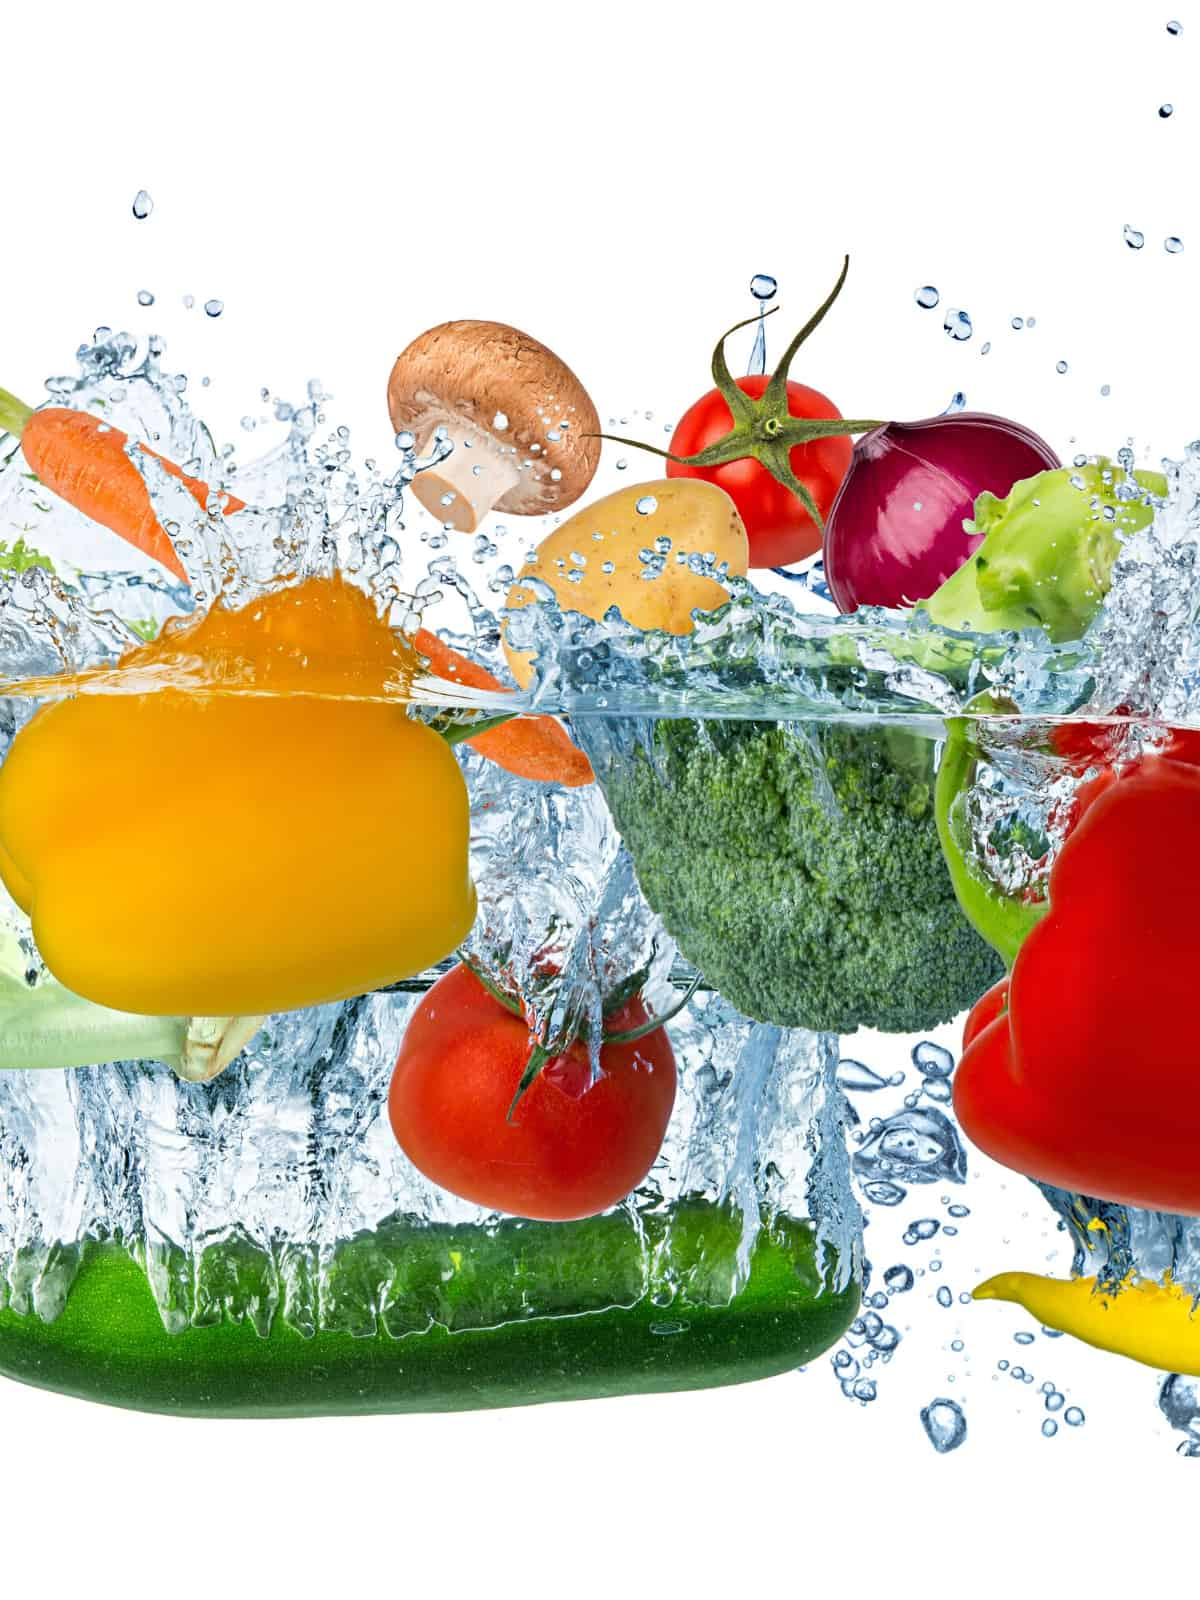 A VARIETY OF MIXED VEGGIES SPLASHING IN WATER